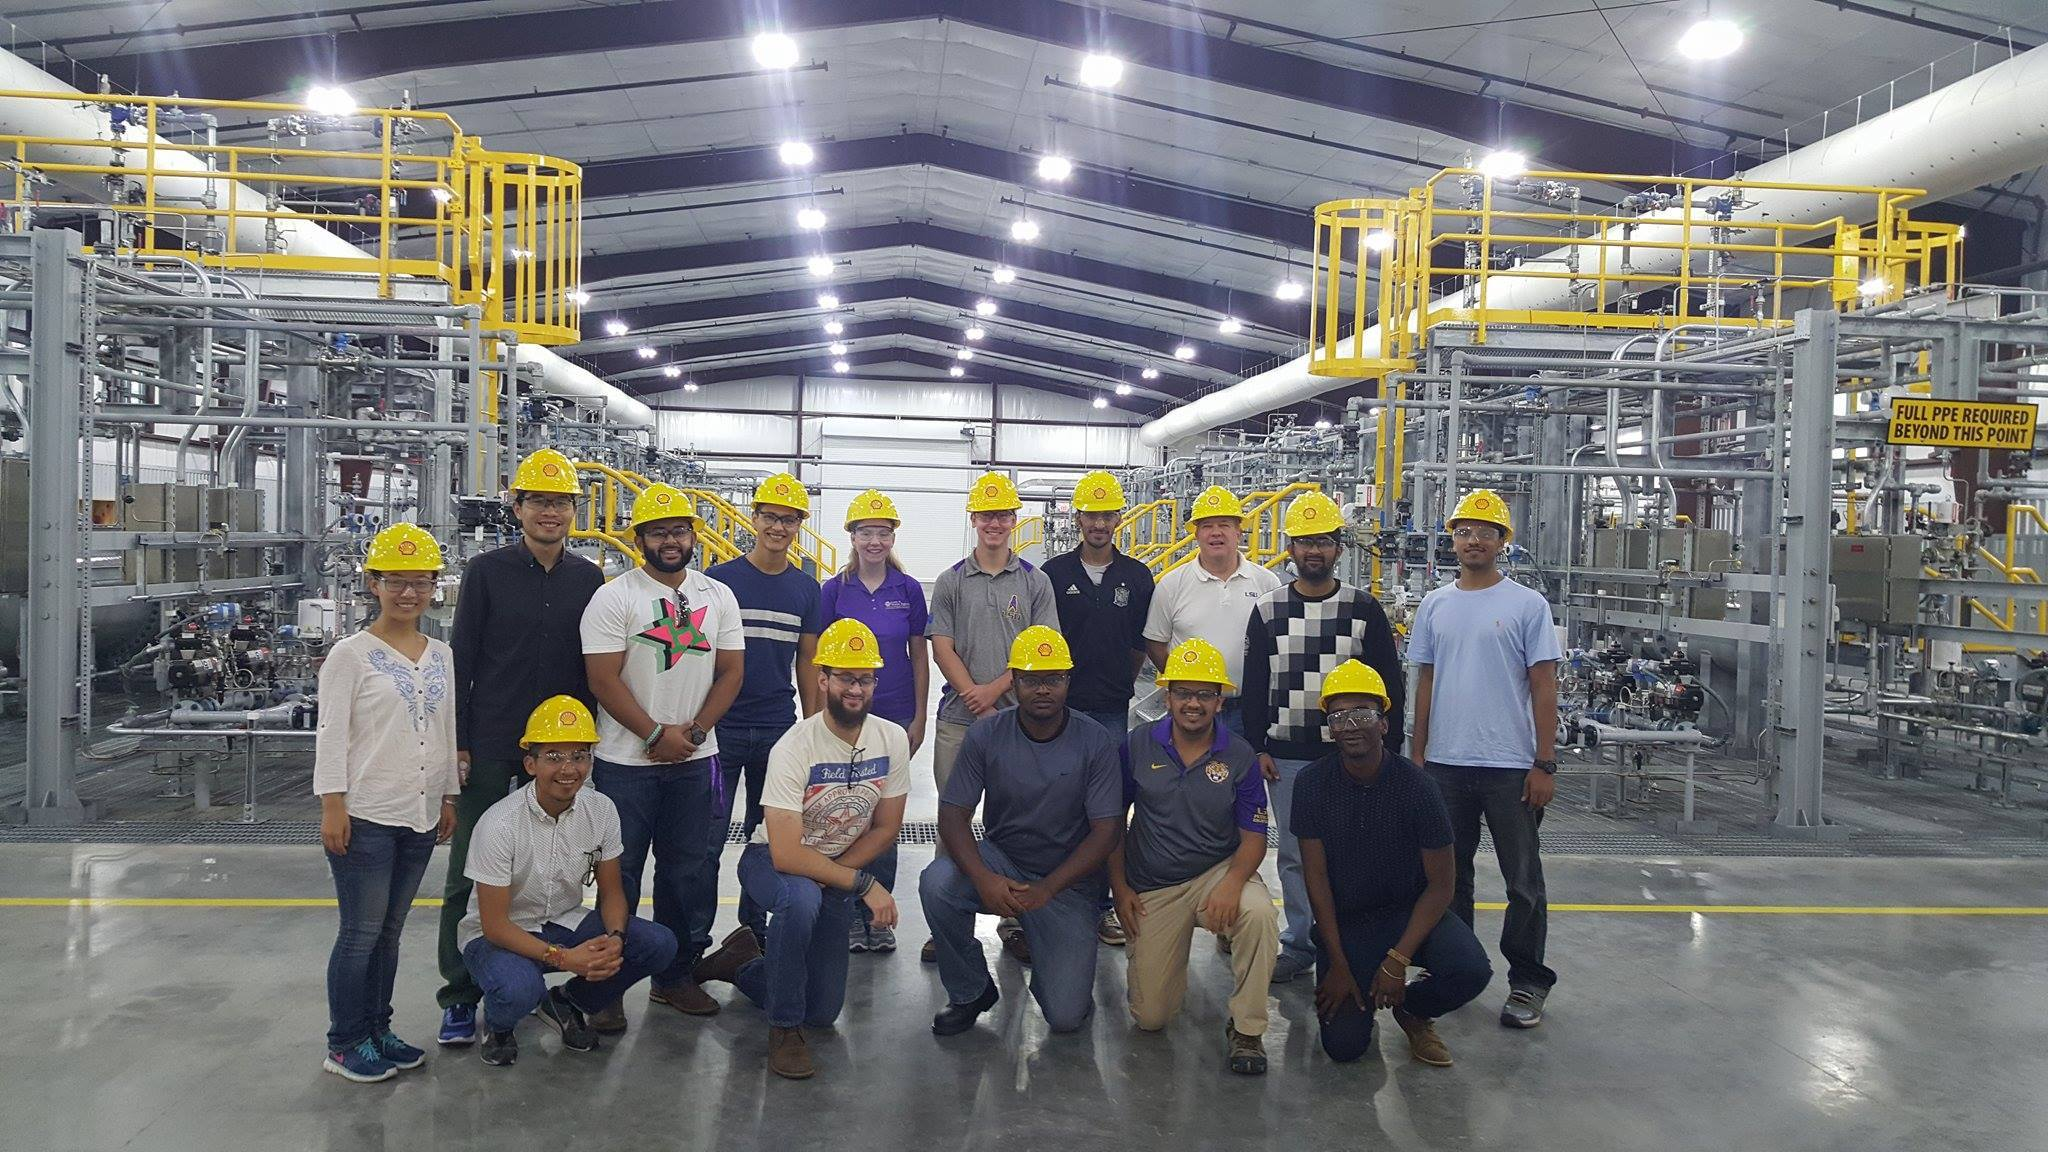 LSU SPE students visit the Shell Robert Training Center